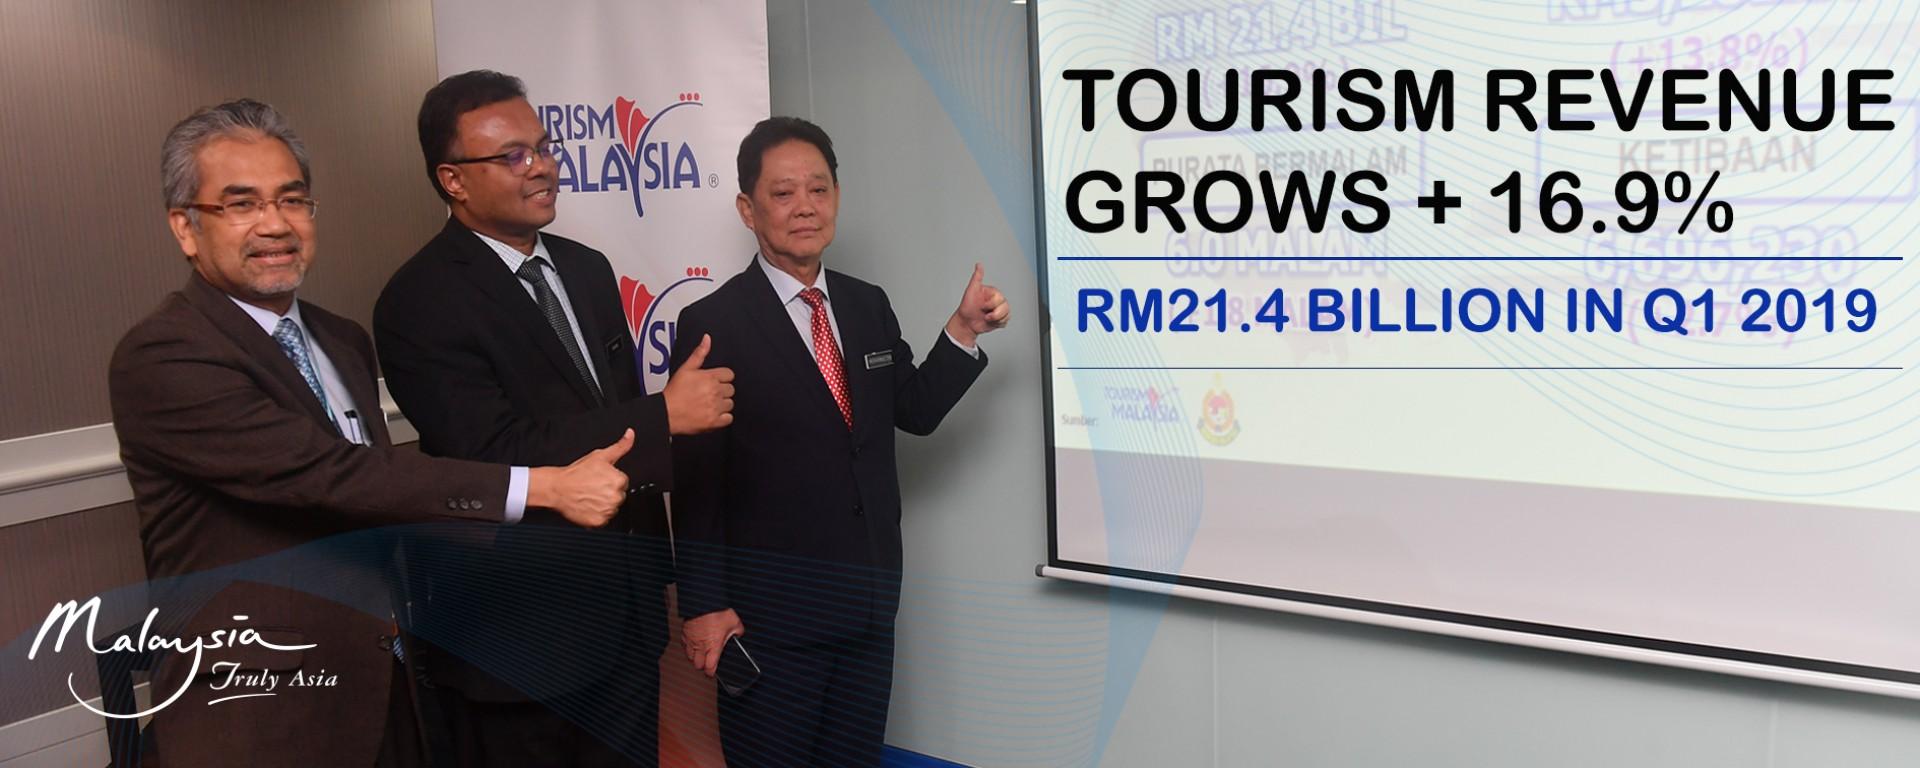 <div class='slider-left'><span class='caption'></span><div class='action'><a href='https://www.tourism.gov.my/media/view/tourism-revenue-grows-16-9-reaches-rm21-4-billion-in-q1-2019' class='btn btn-danger btn-lg' target=''>Read more</a></div></div>